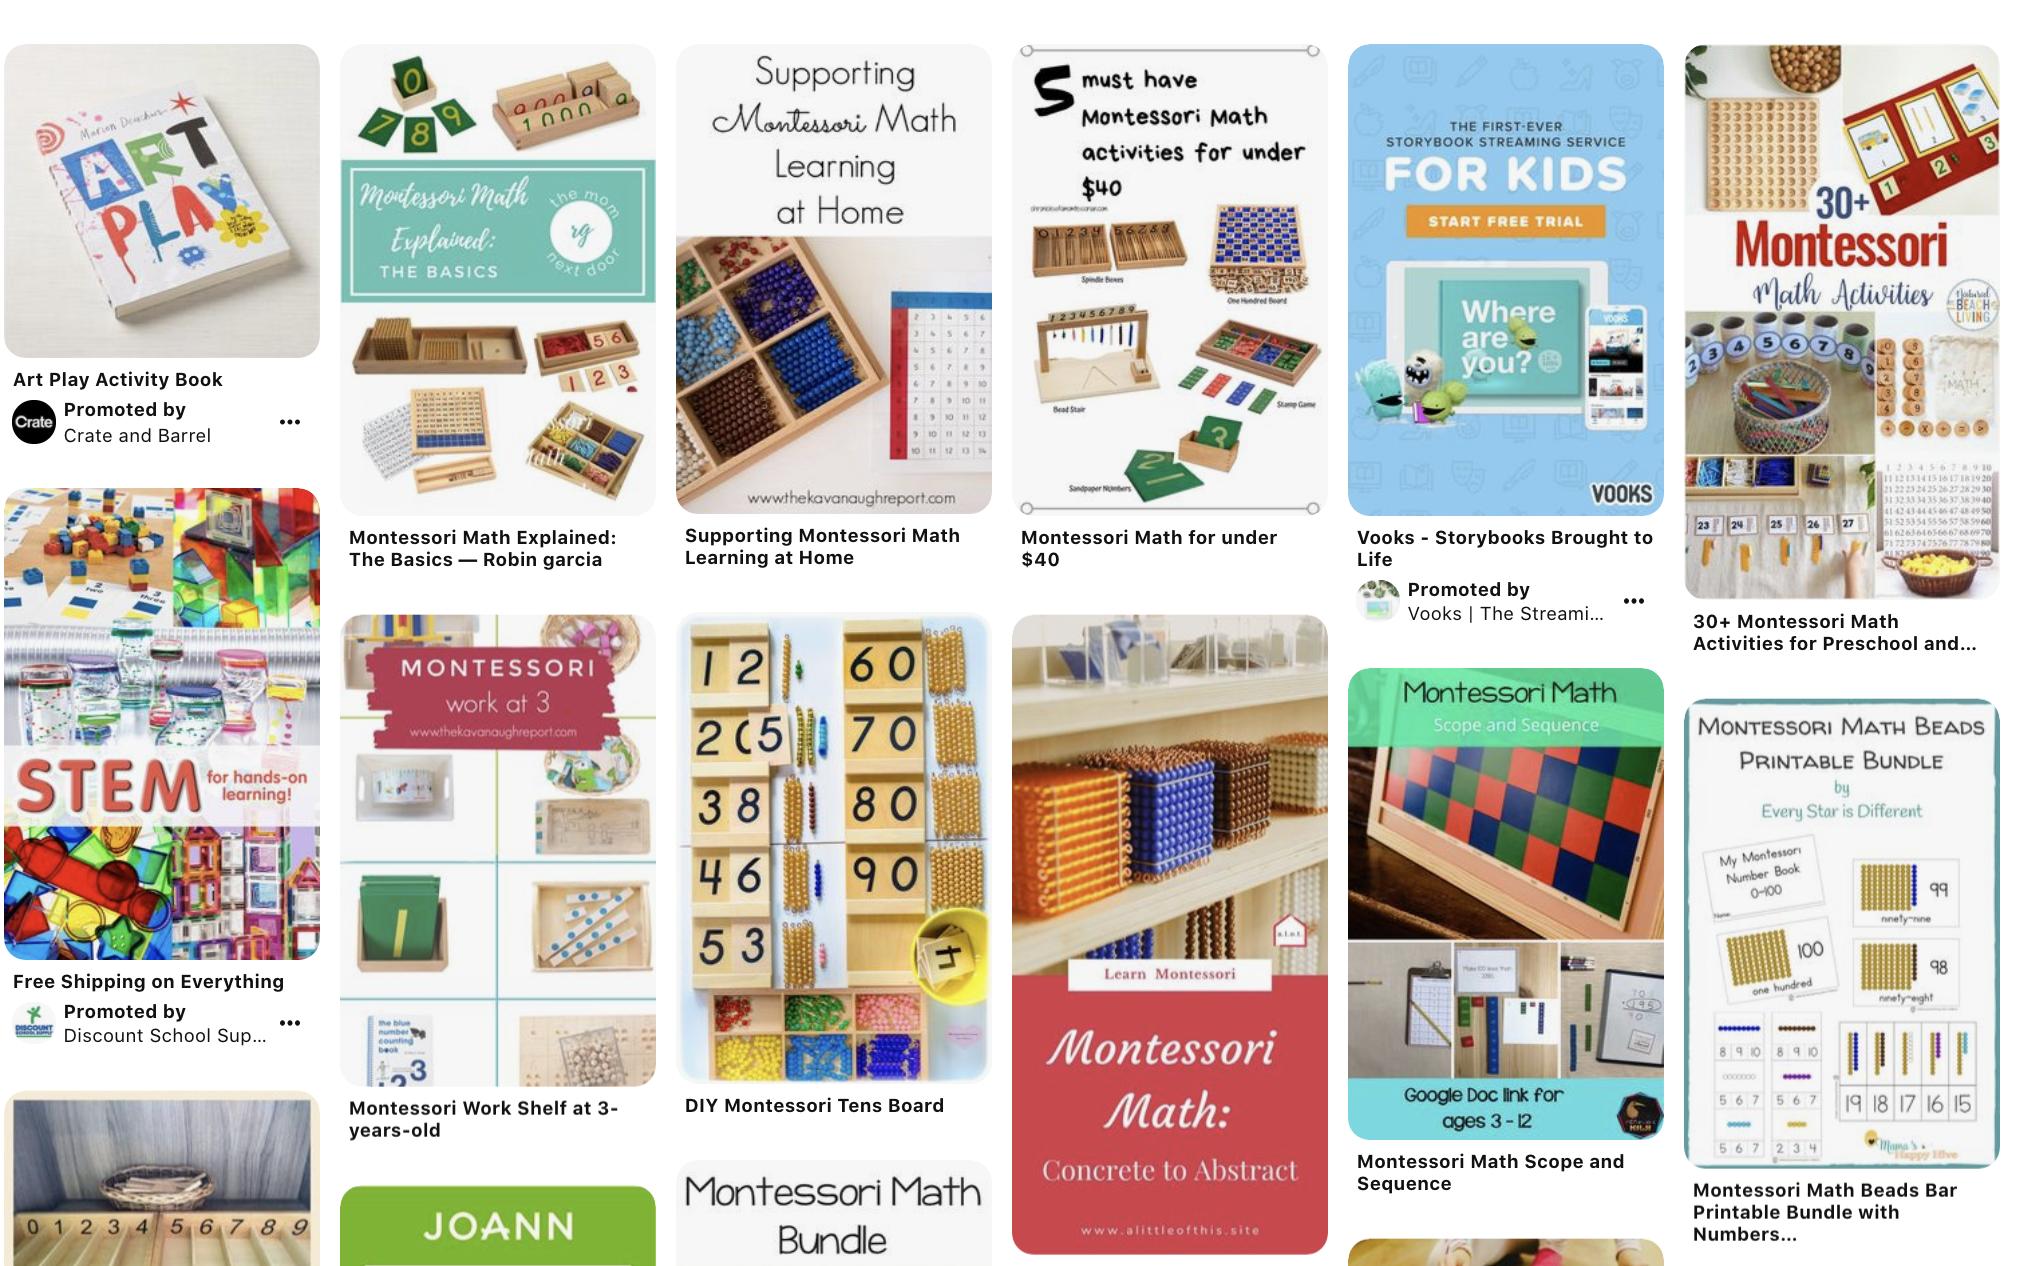 Math worksheets found on Pinterest